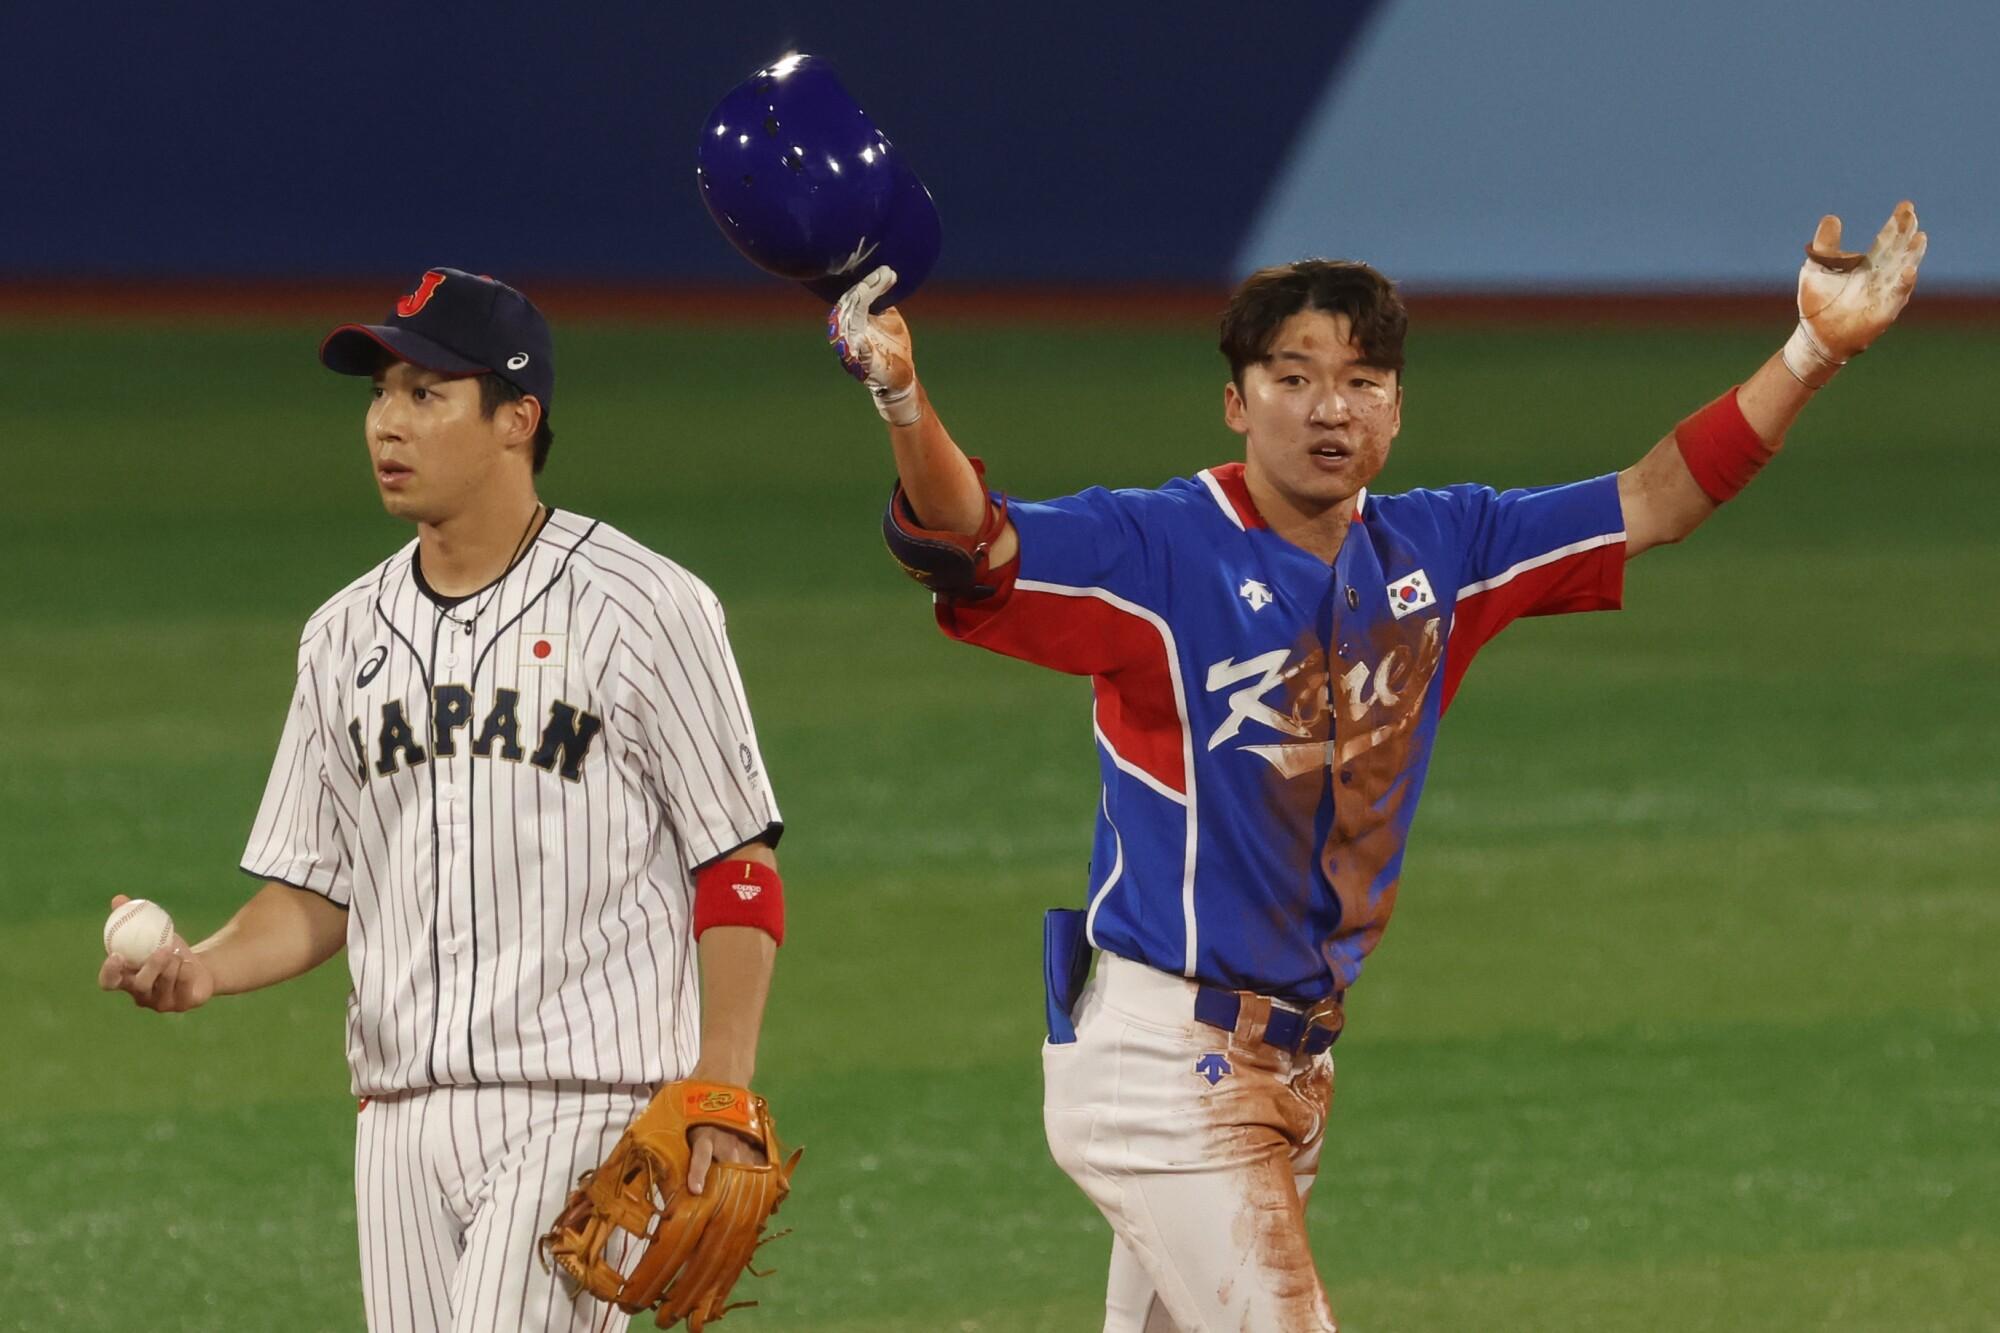 South Korea outfielder Hae Min Park celebrates next to Japan infielder Tetsuto Yamada.